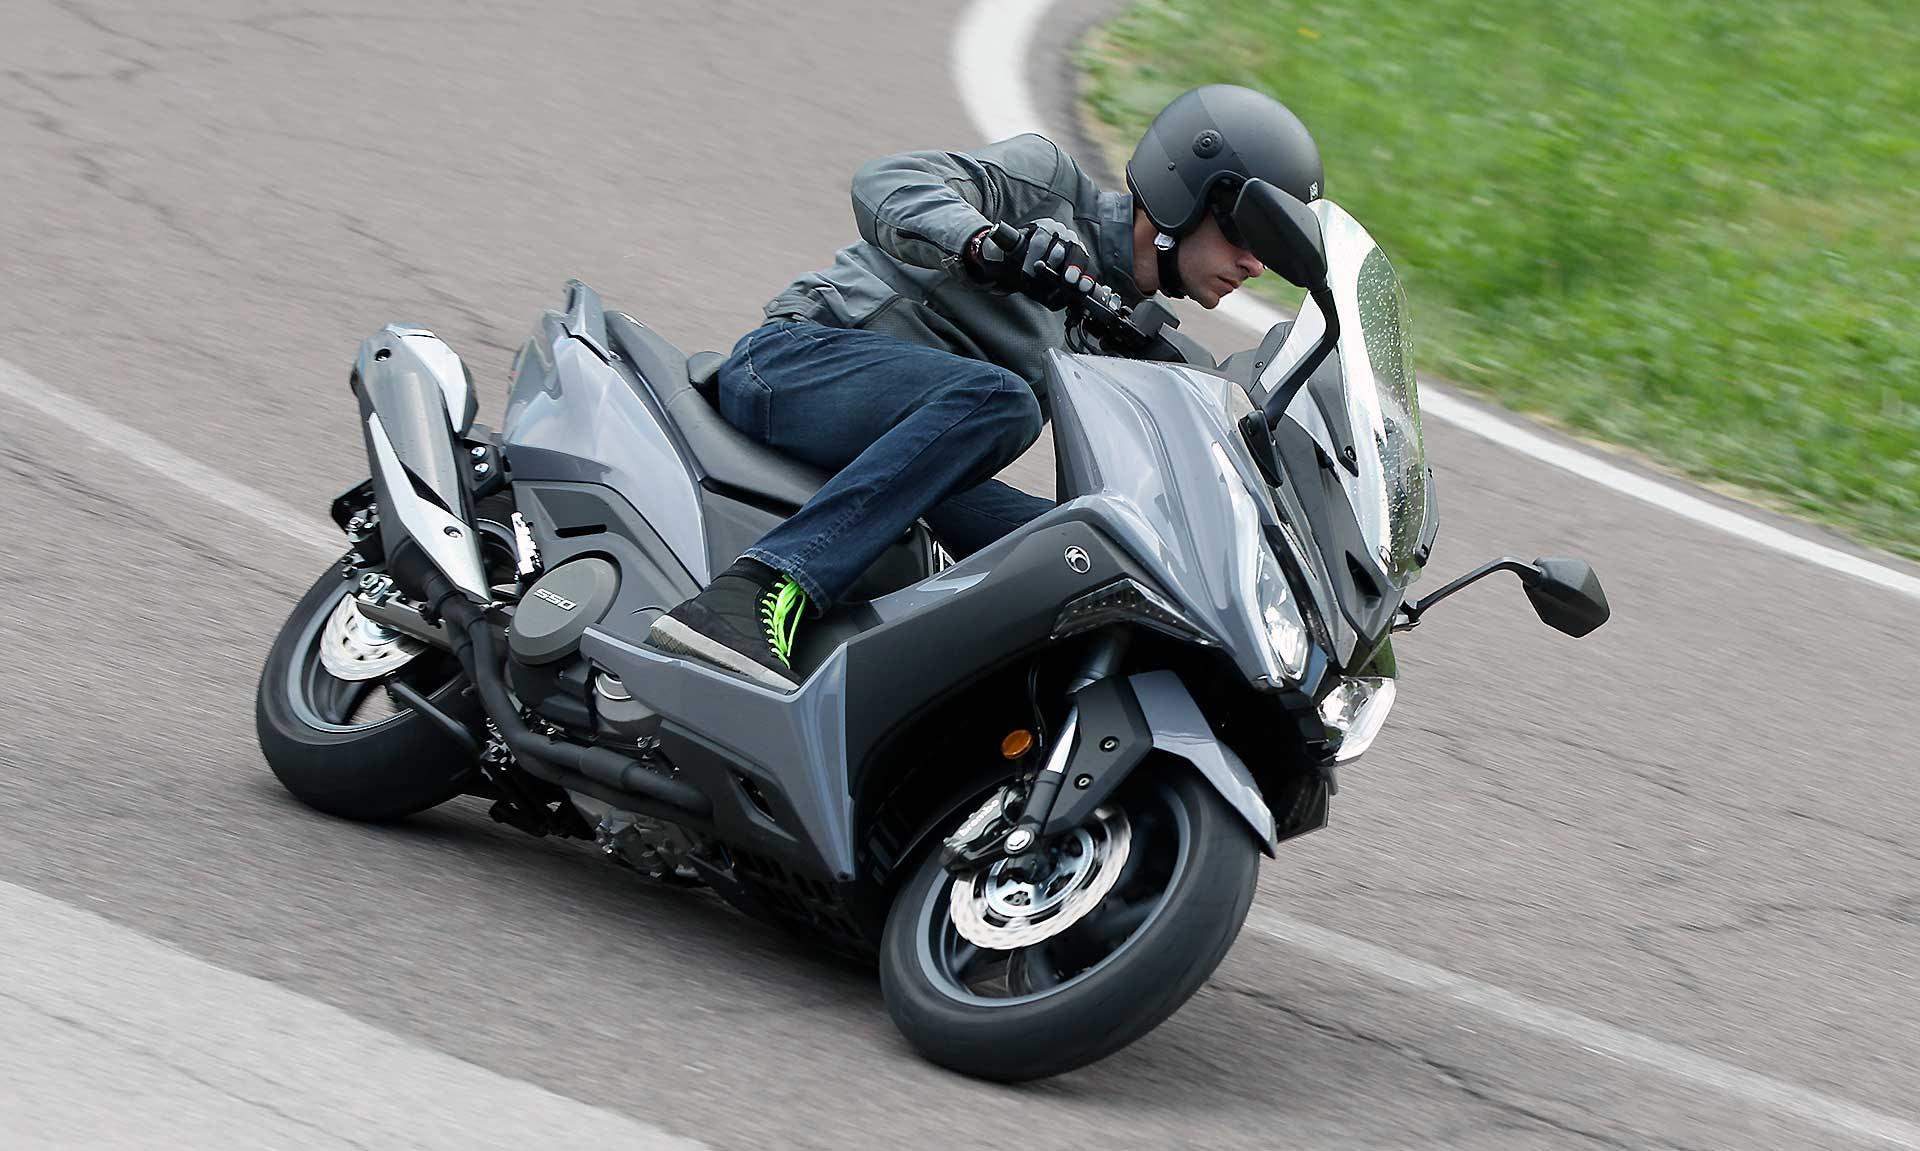 Kymco AK 550 Migliori maxi scooter